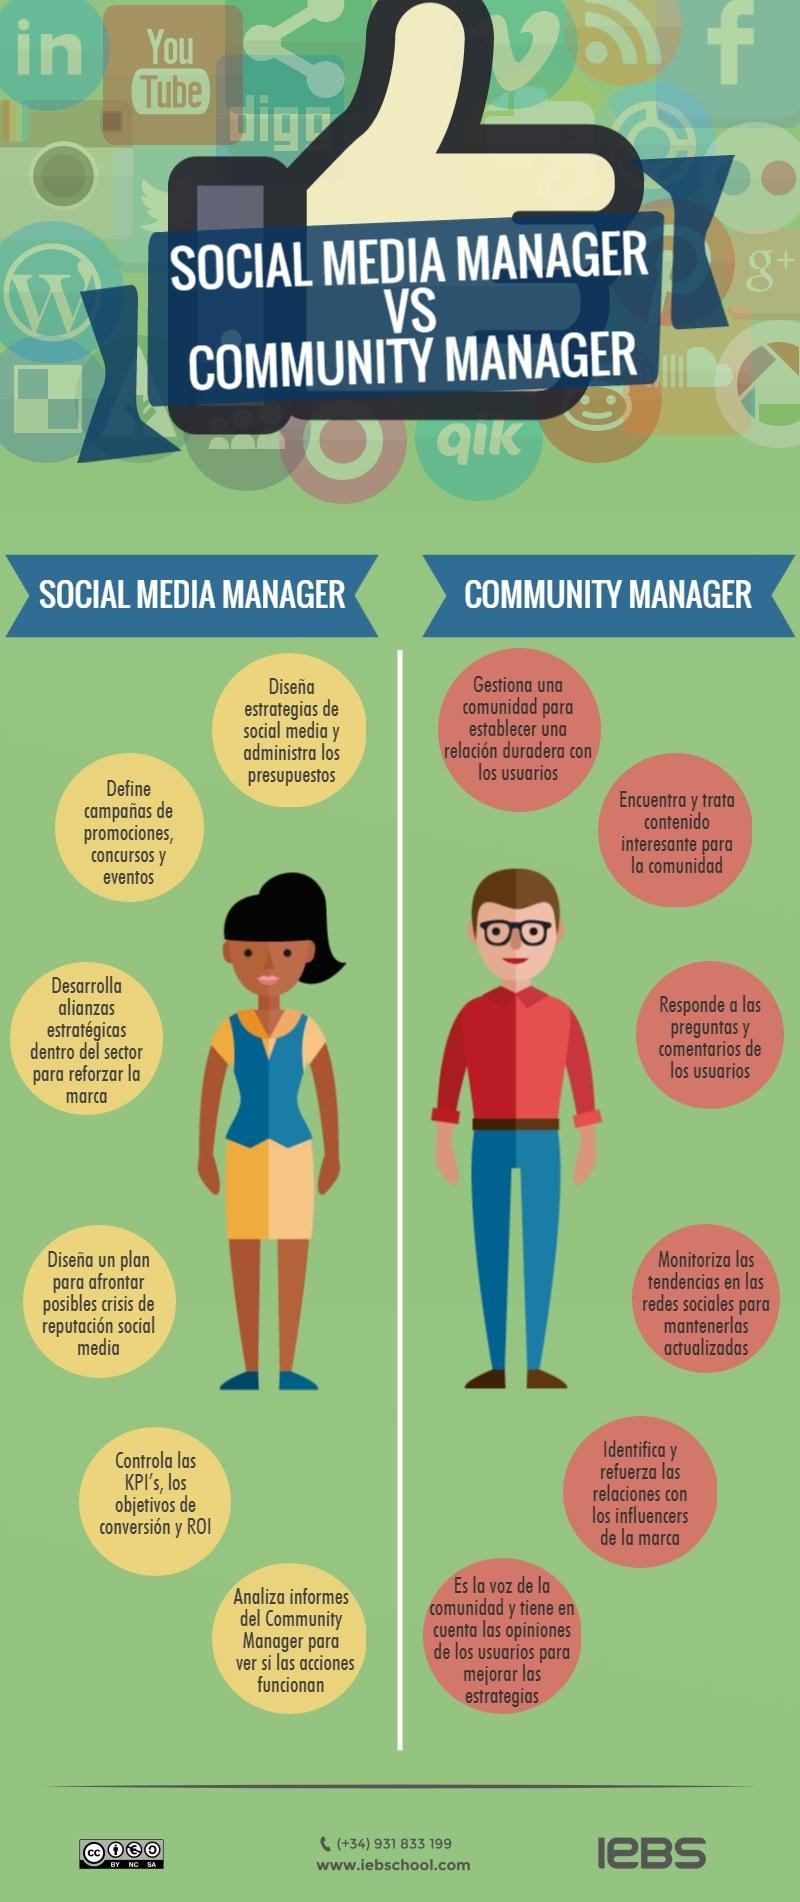 Social Media Manager vs Community Manager - Social Media Manager VS Community Manager1